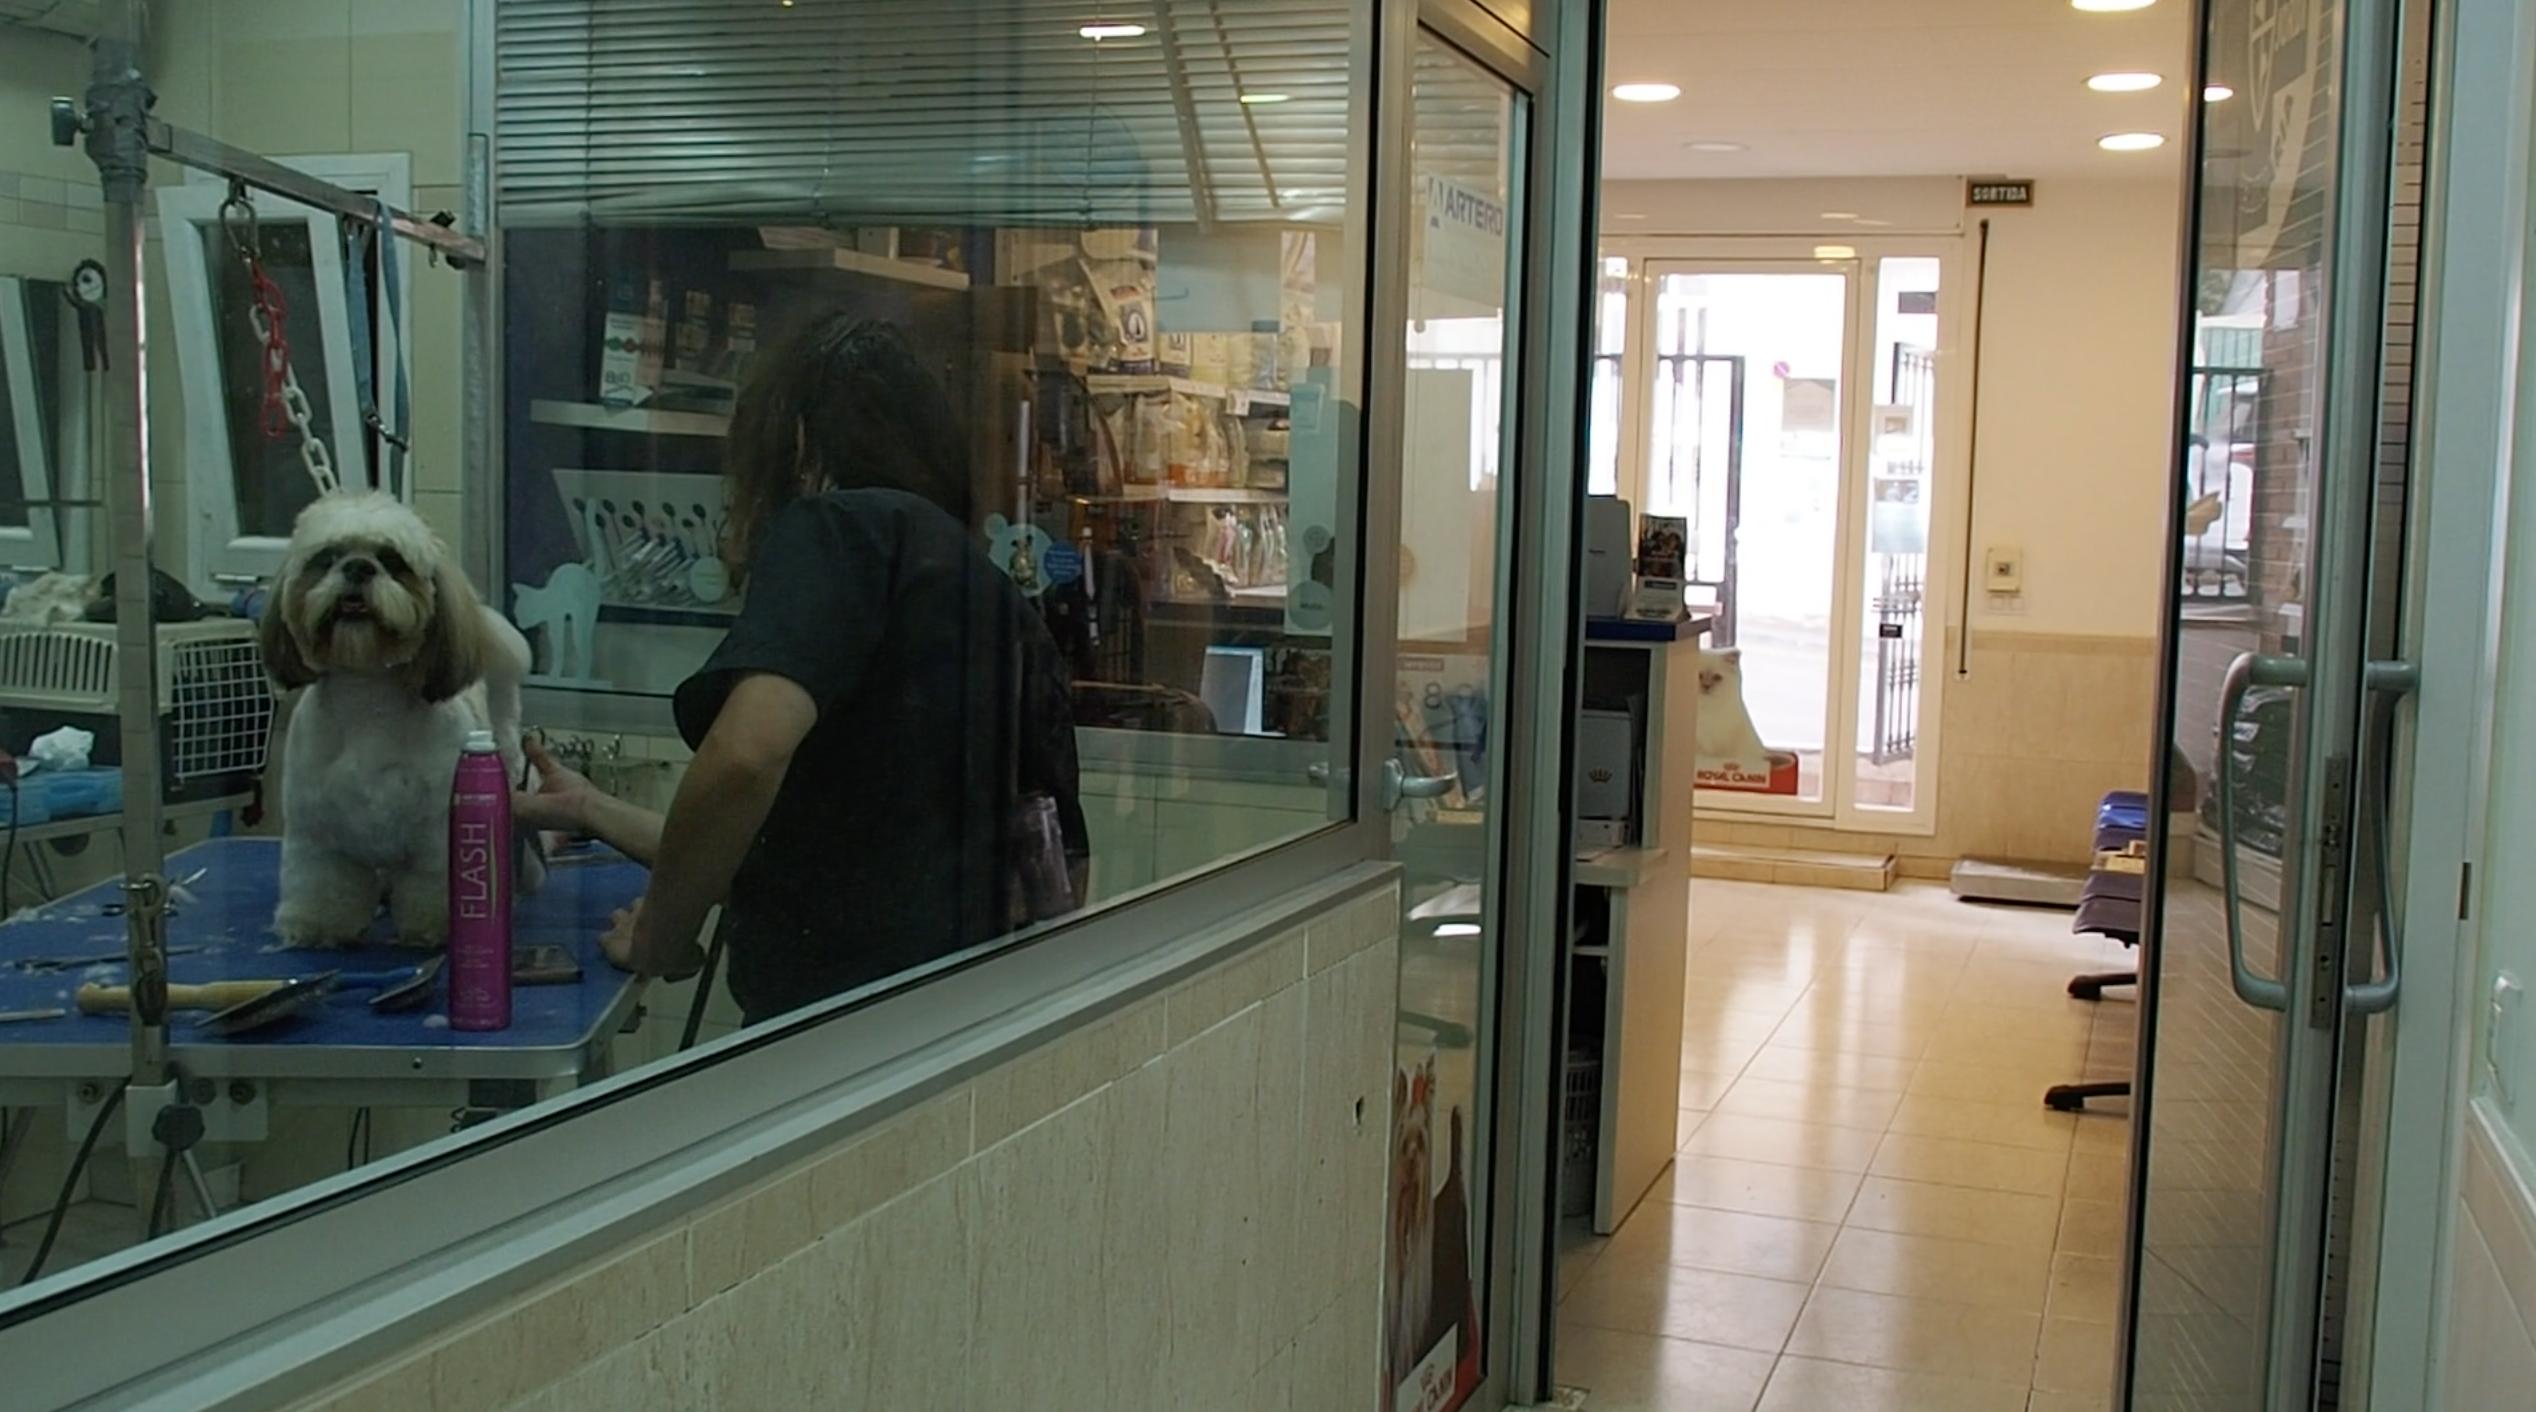 Peluqueria-y-recepcion-clinica-canet